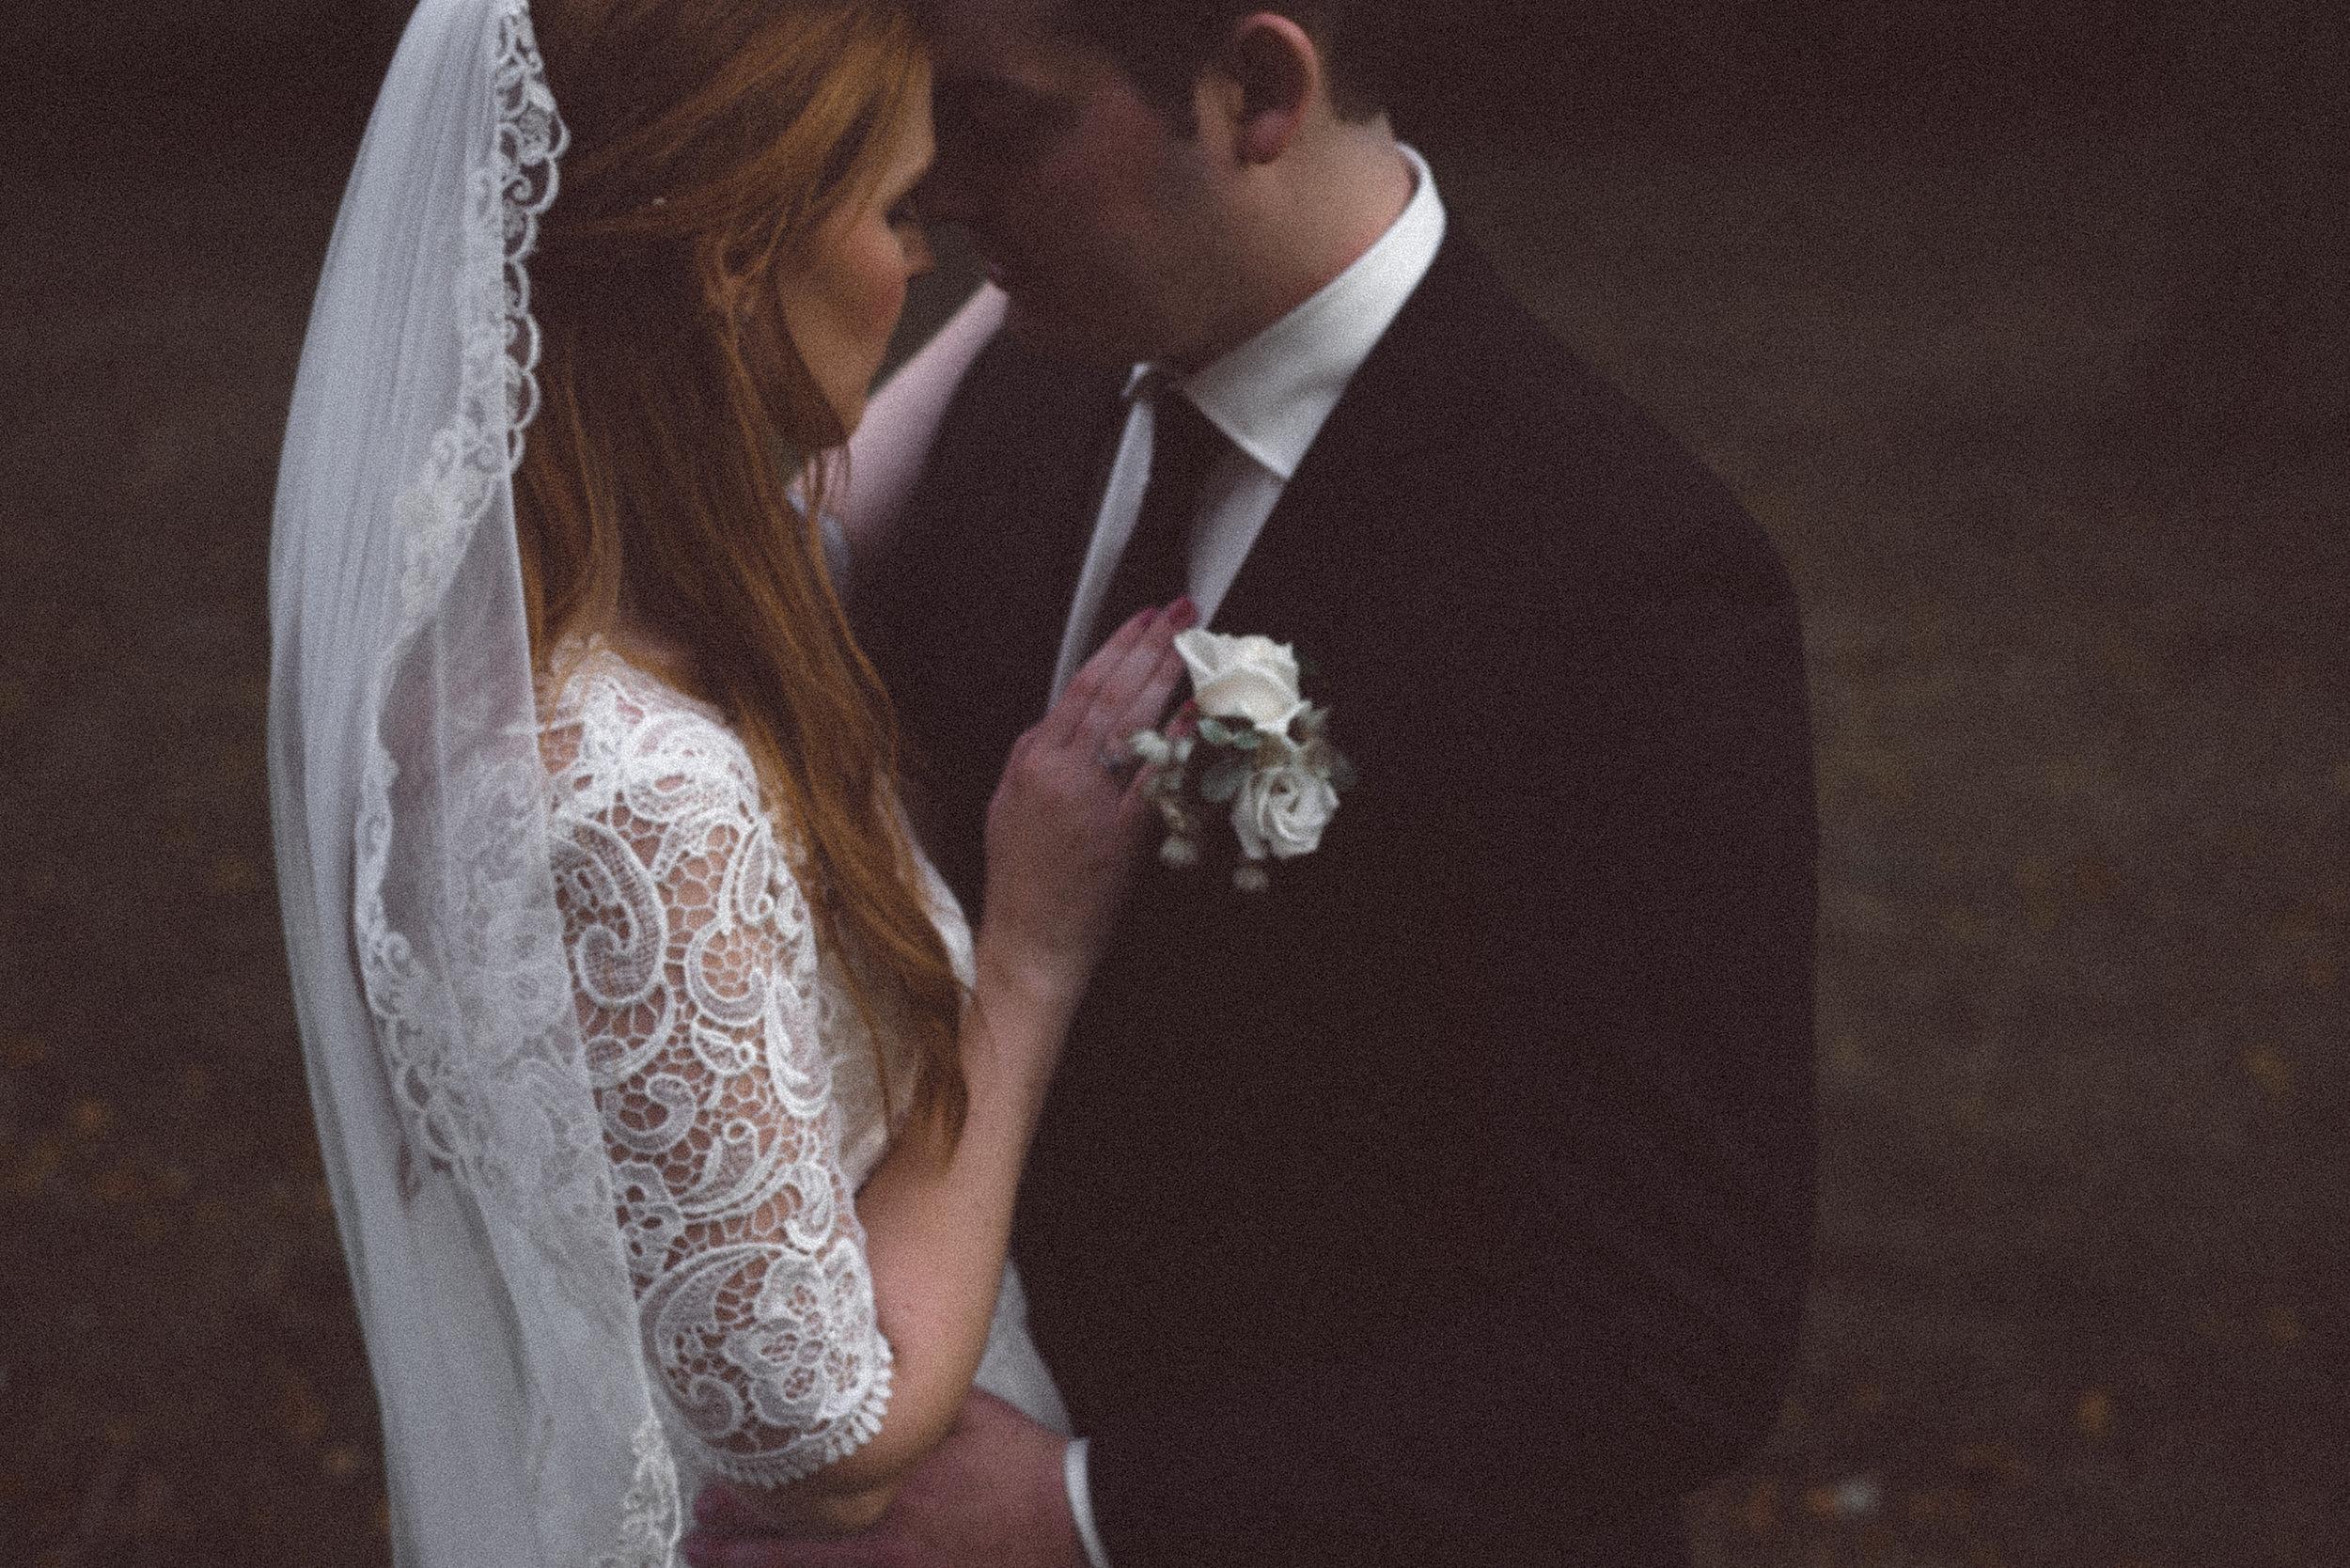 York Region Ontario Wedding Photographer - Bride + Groom-24.jpg